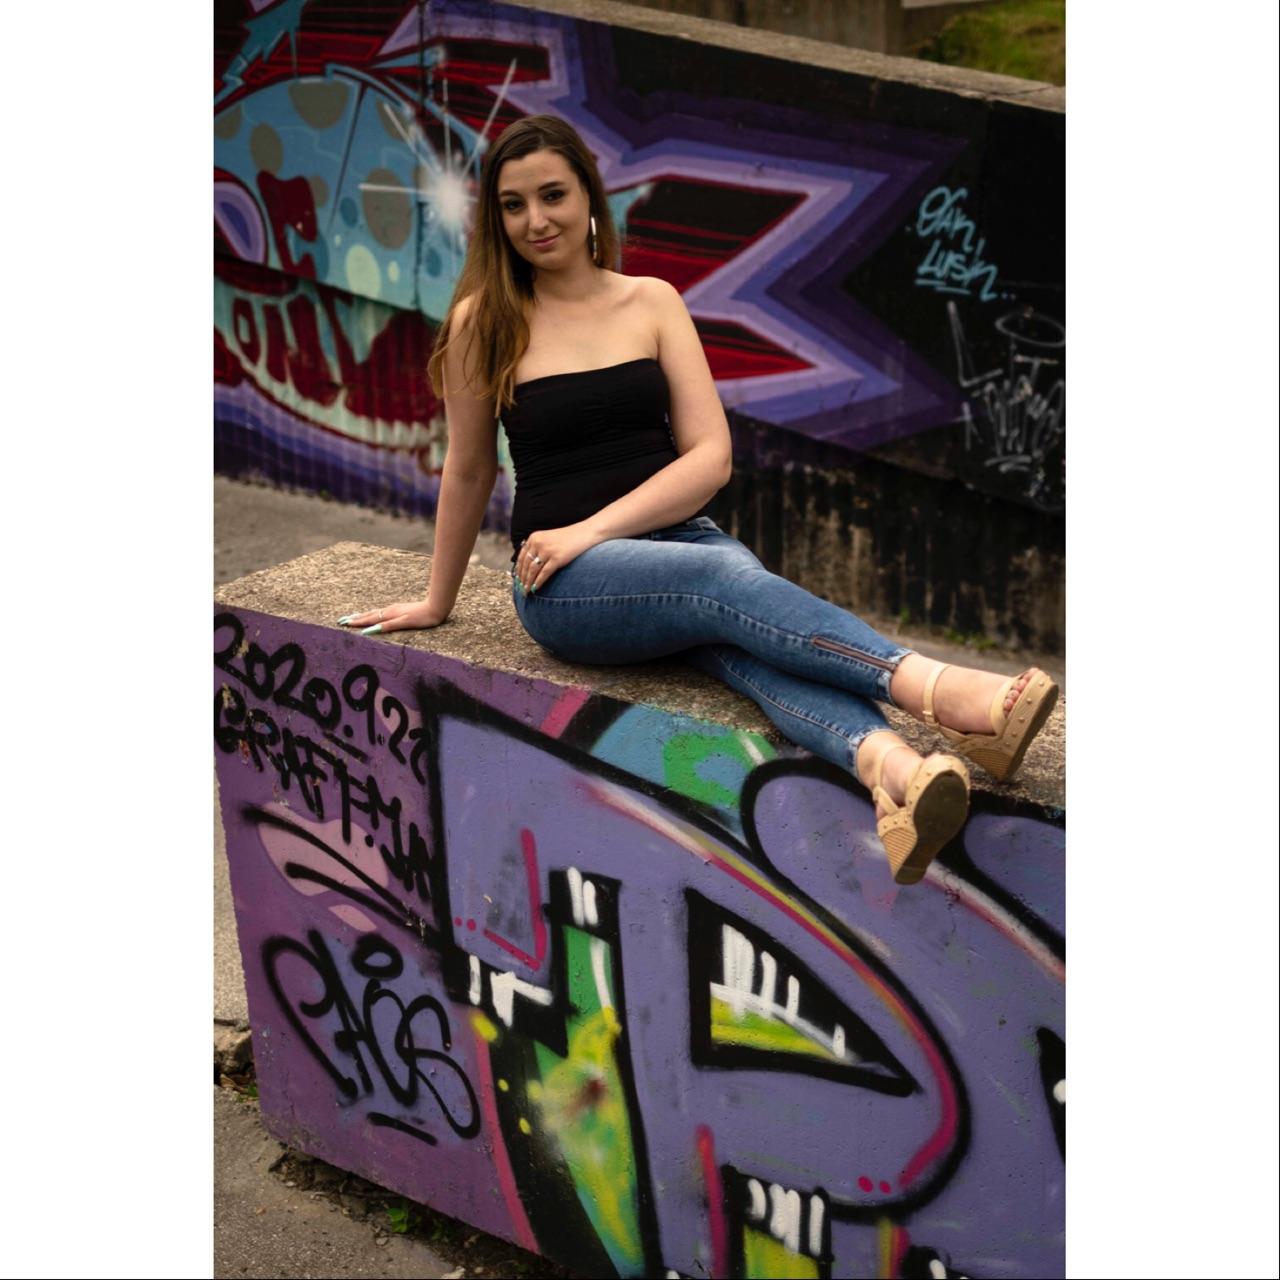 graffiti, Libra, and me image